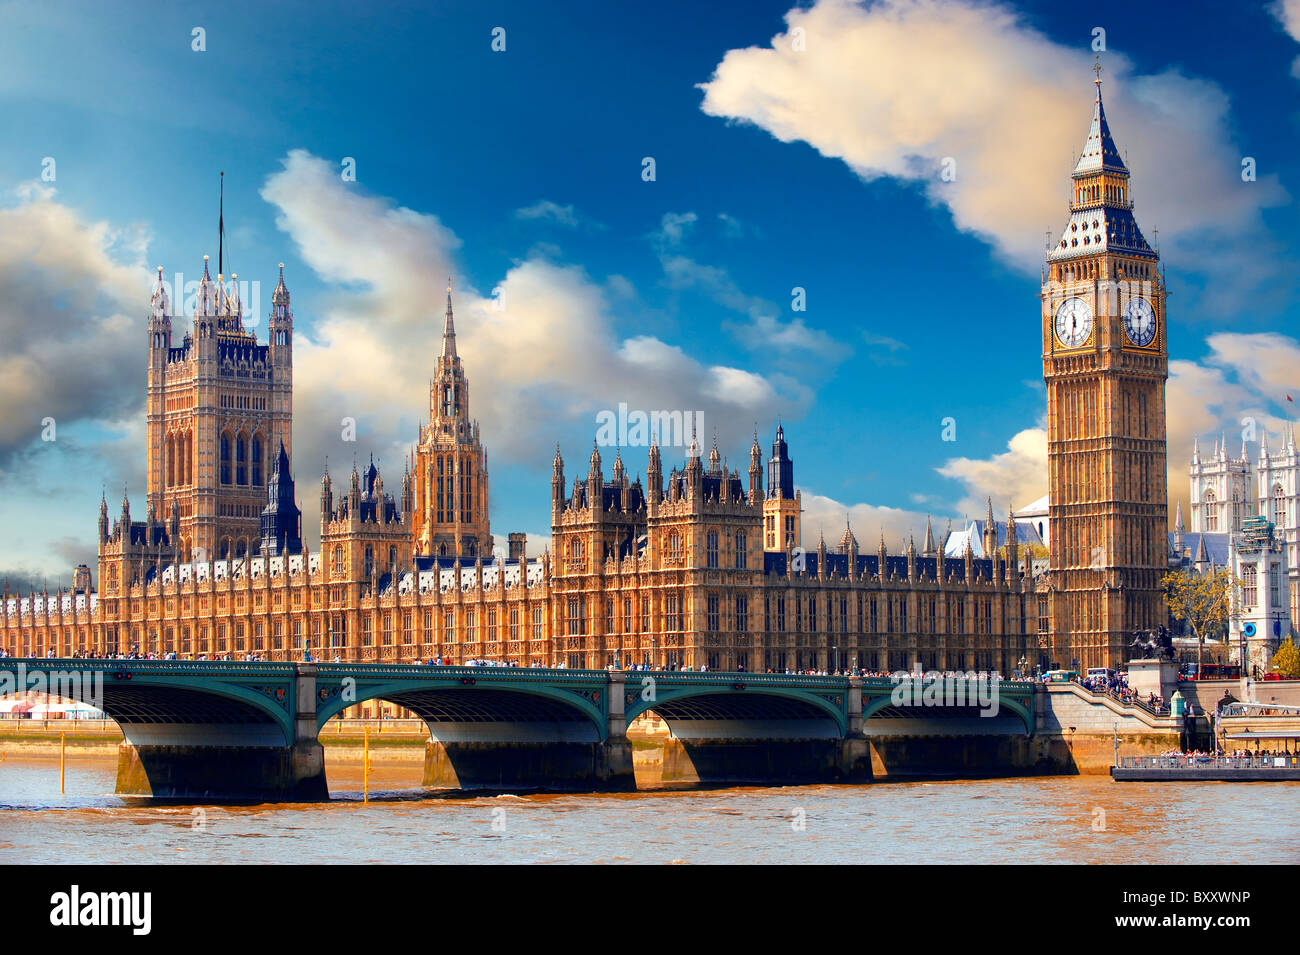 Chambres du Parlement, Westminster, Londres Banque D'Images